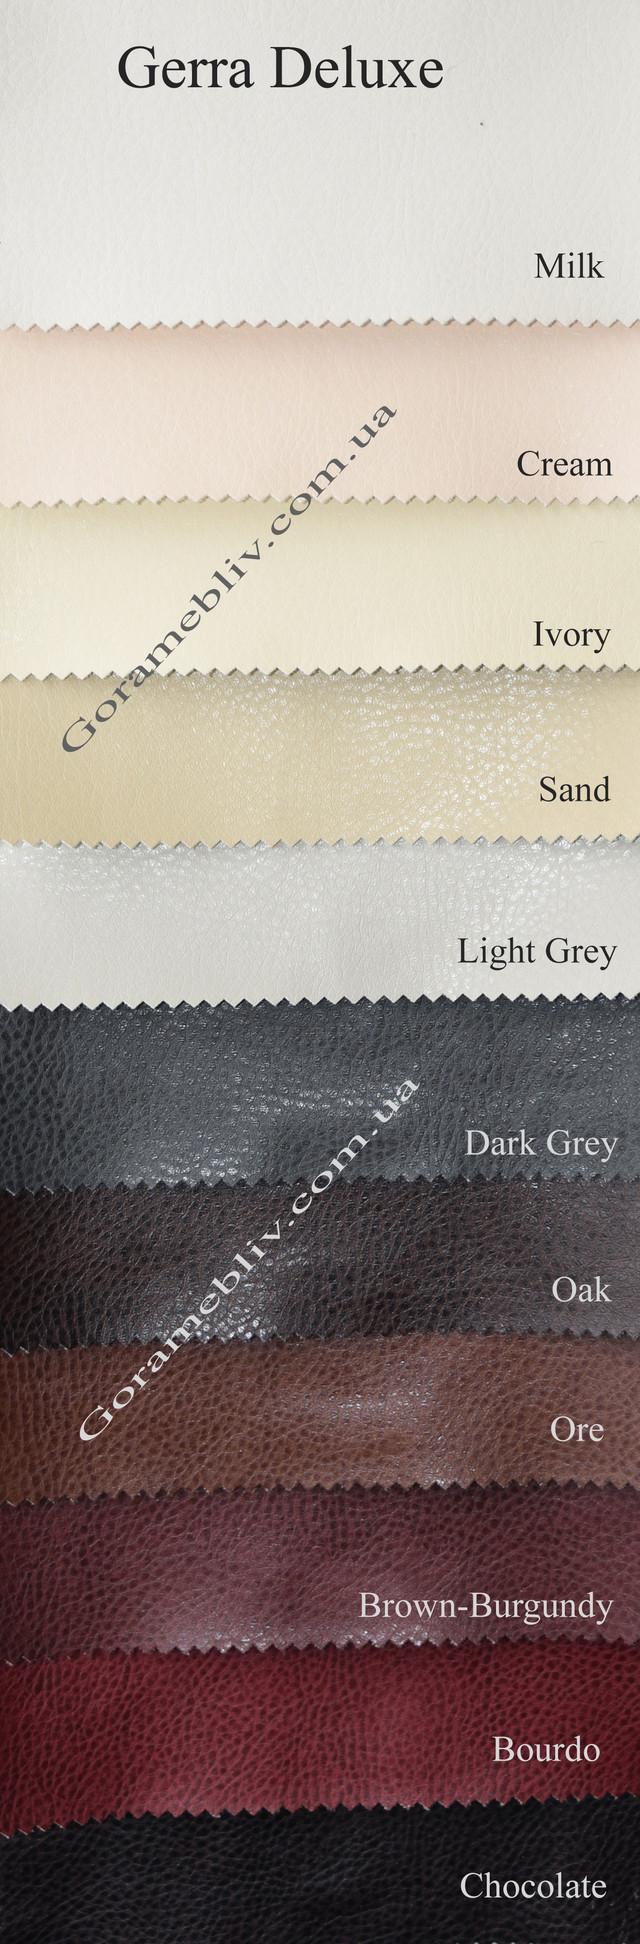 На фото: образцы кожзама Гера Делюкс